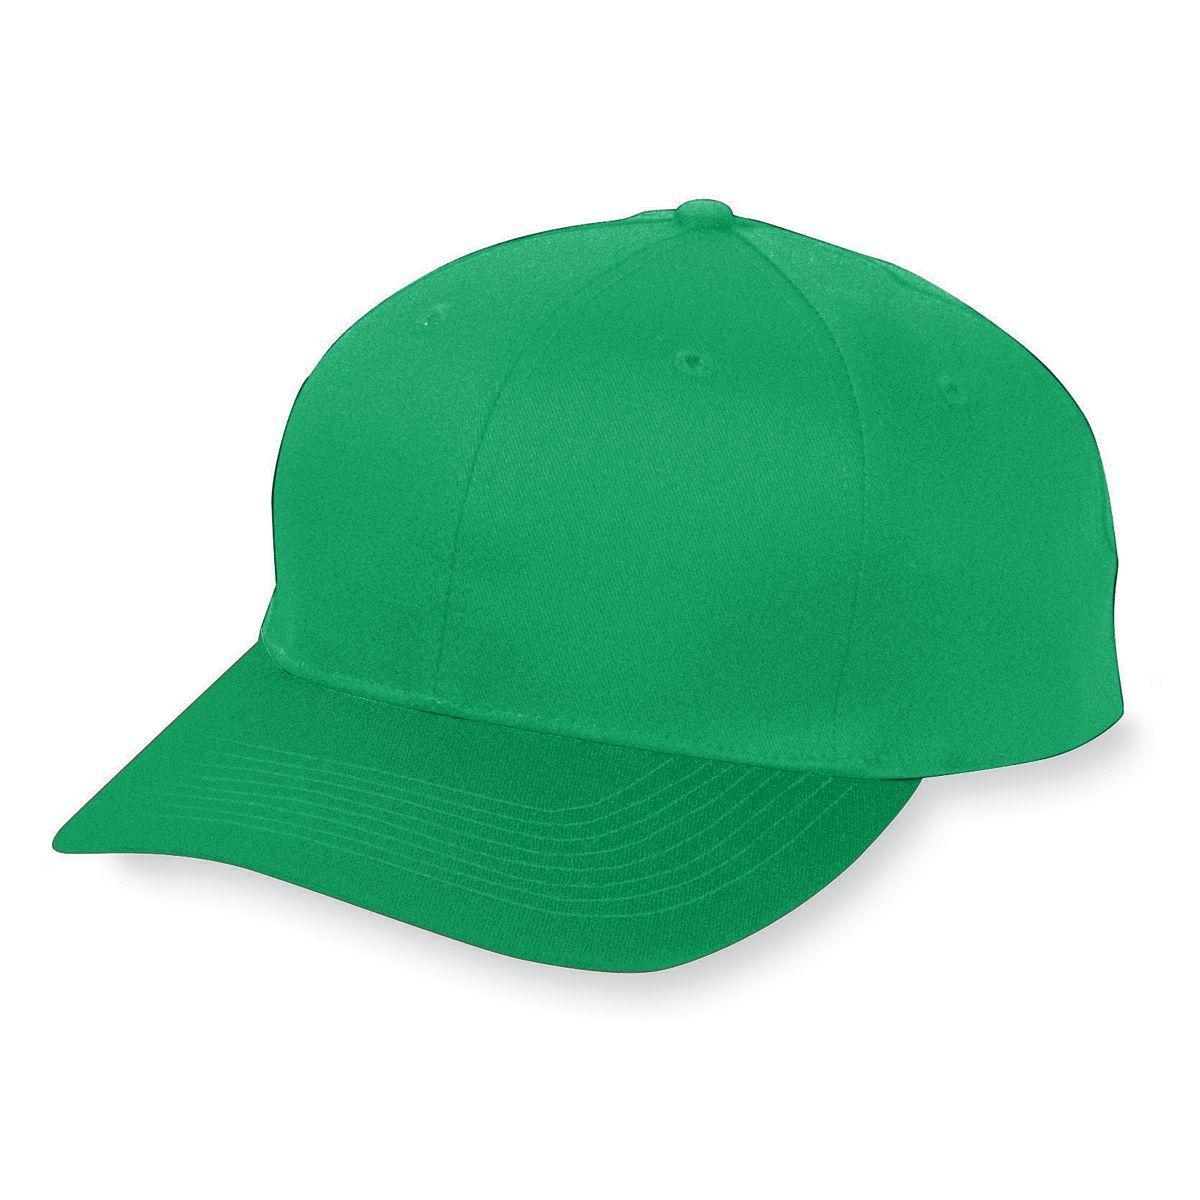 Six-Panel Cotton Twill Low-Profile Cap - KELLY